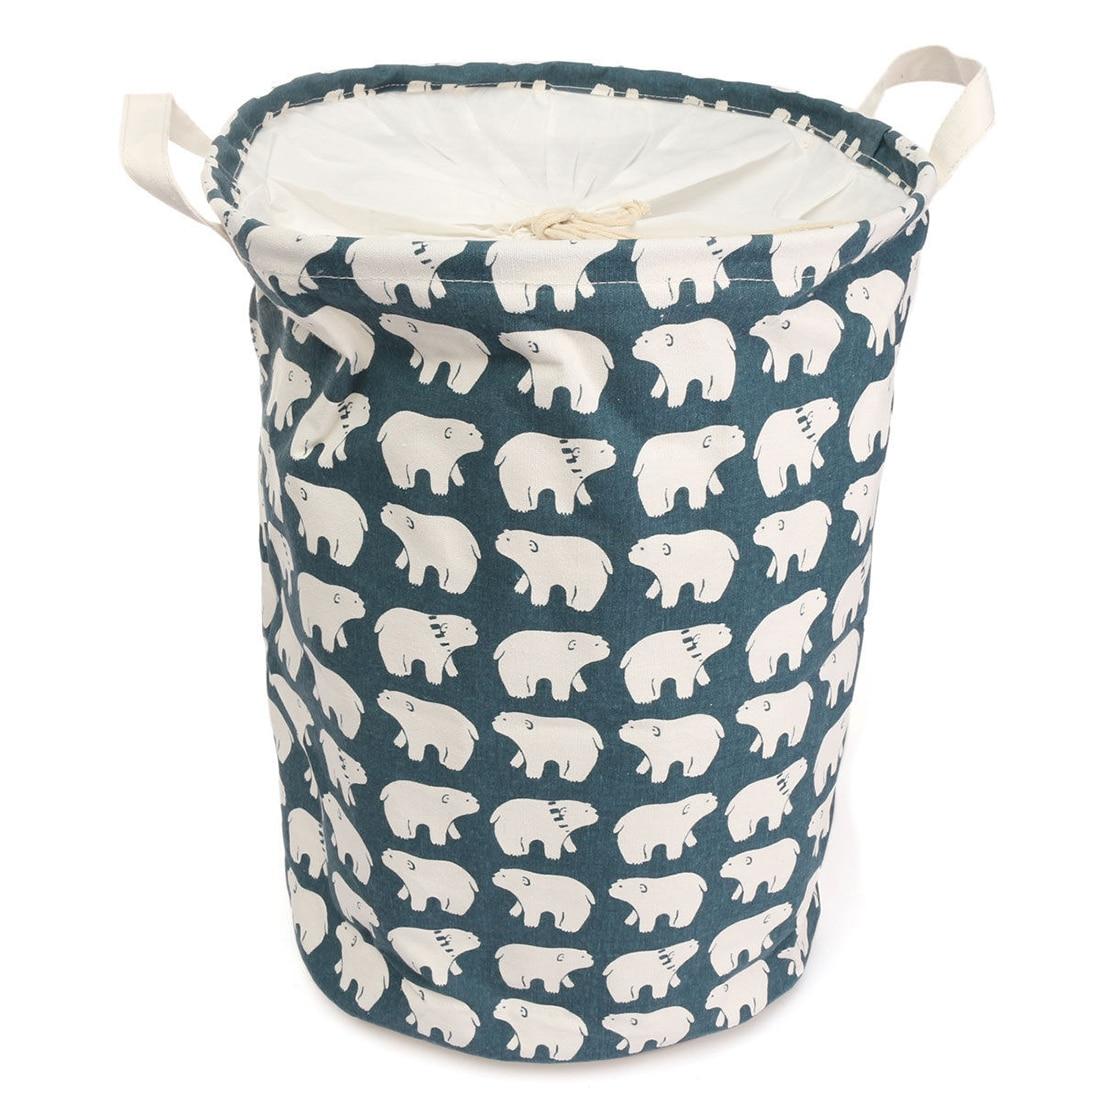 Foldable Cotton Linen Washing Clothes Laundry Basket Sorter Bag Hamper Storage,Blue Polar Bear-35*45Cm